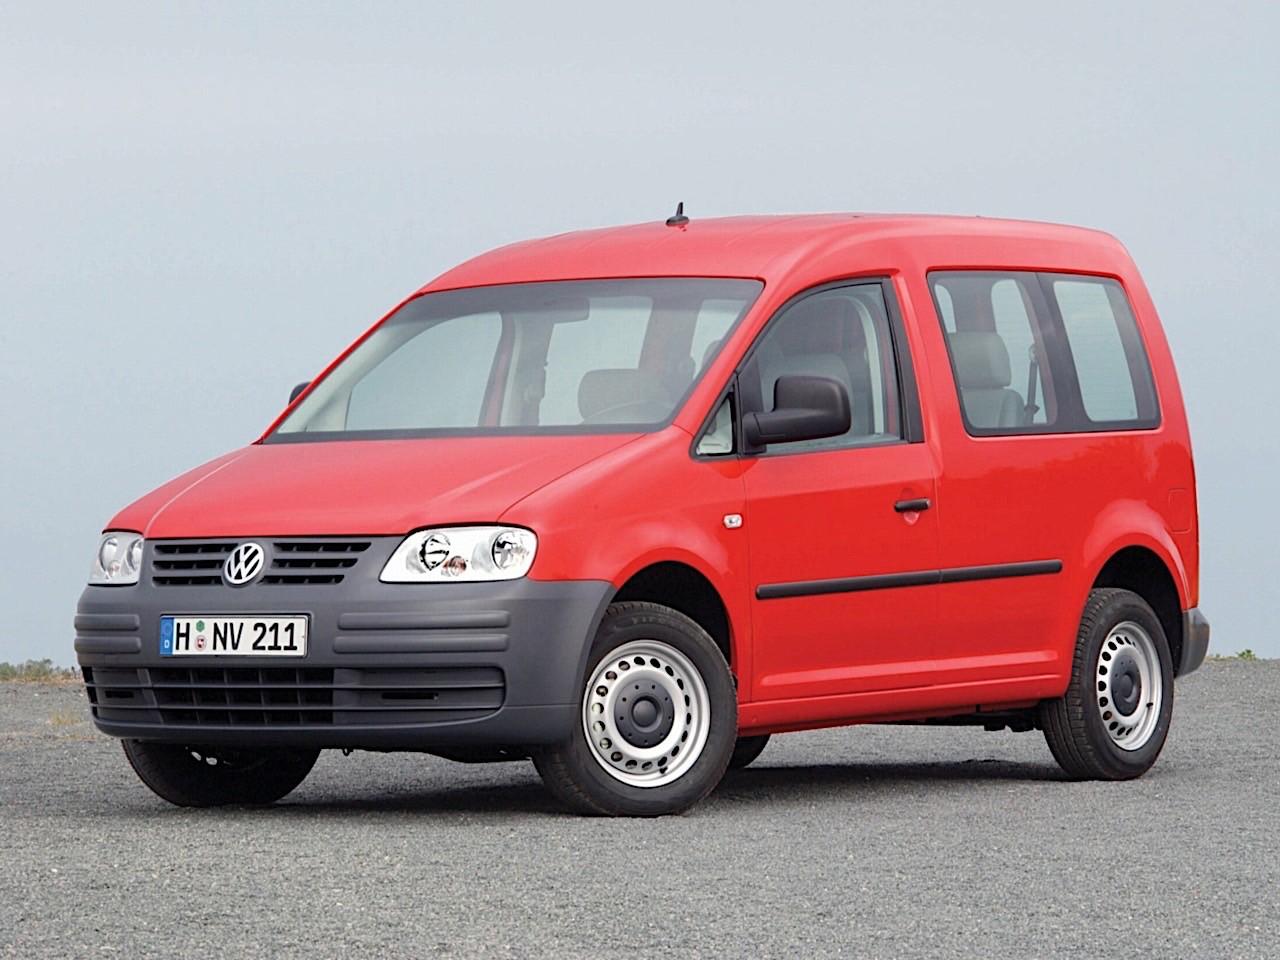 volkswagen caddy specs 2005 2006 2007 2008 2009 2010 autoevolution. Black Bedroom Furniture Sets. Home Design Ideas